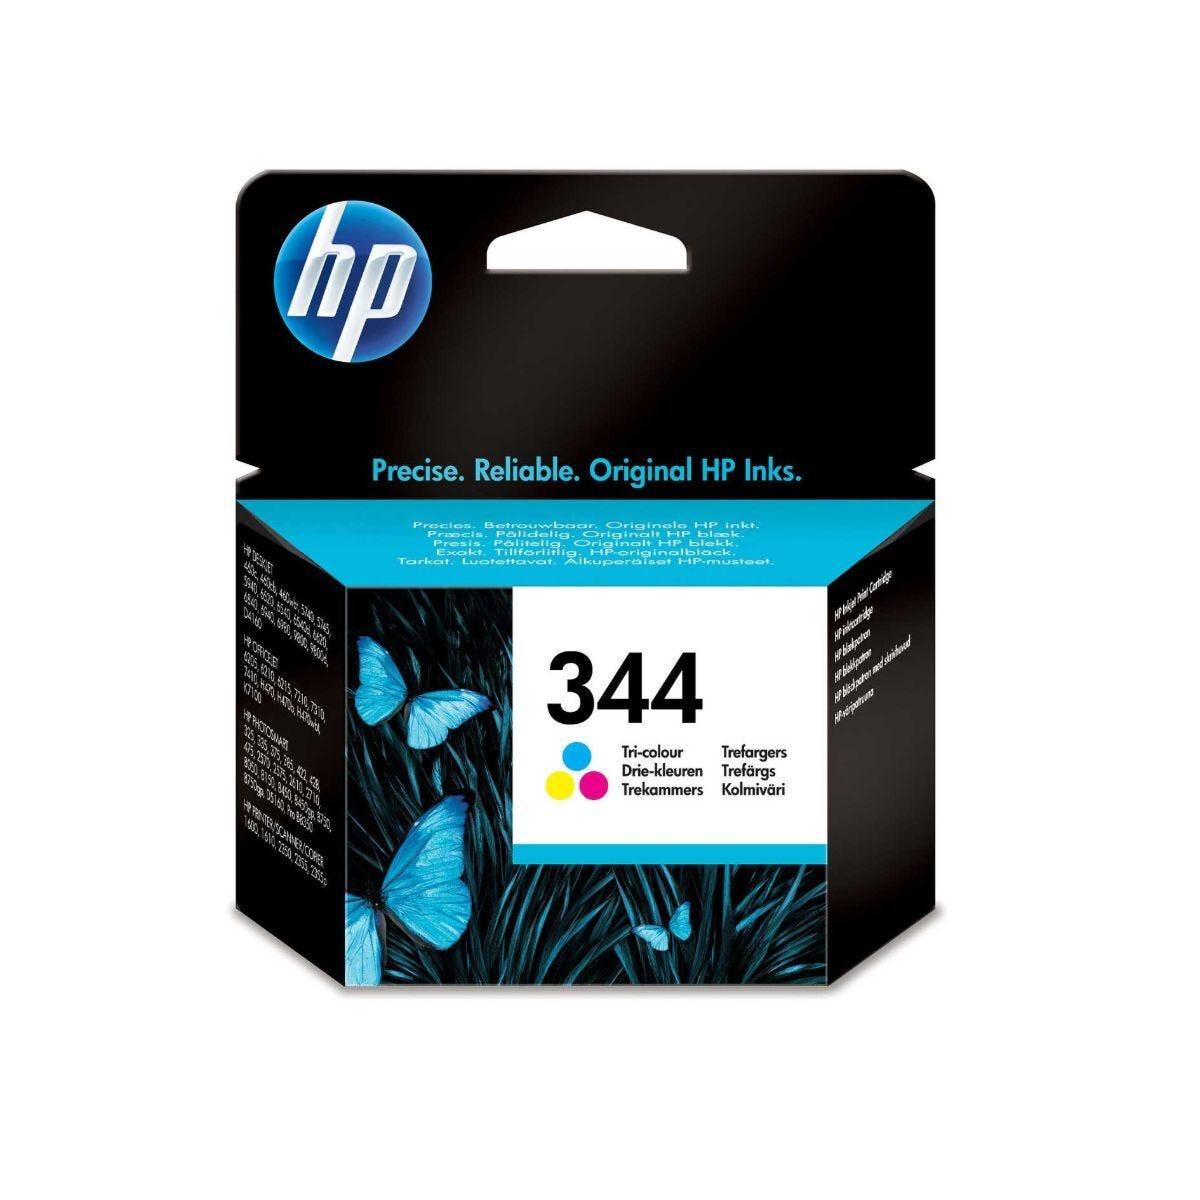 HP 344 Ink Cartridge 14ml